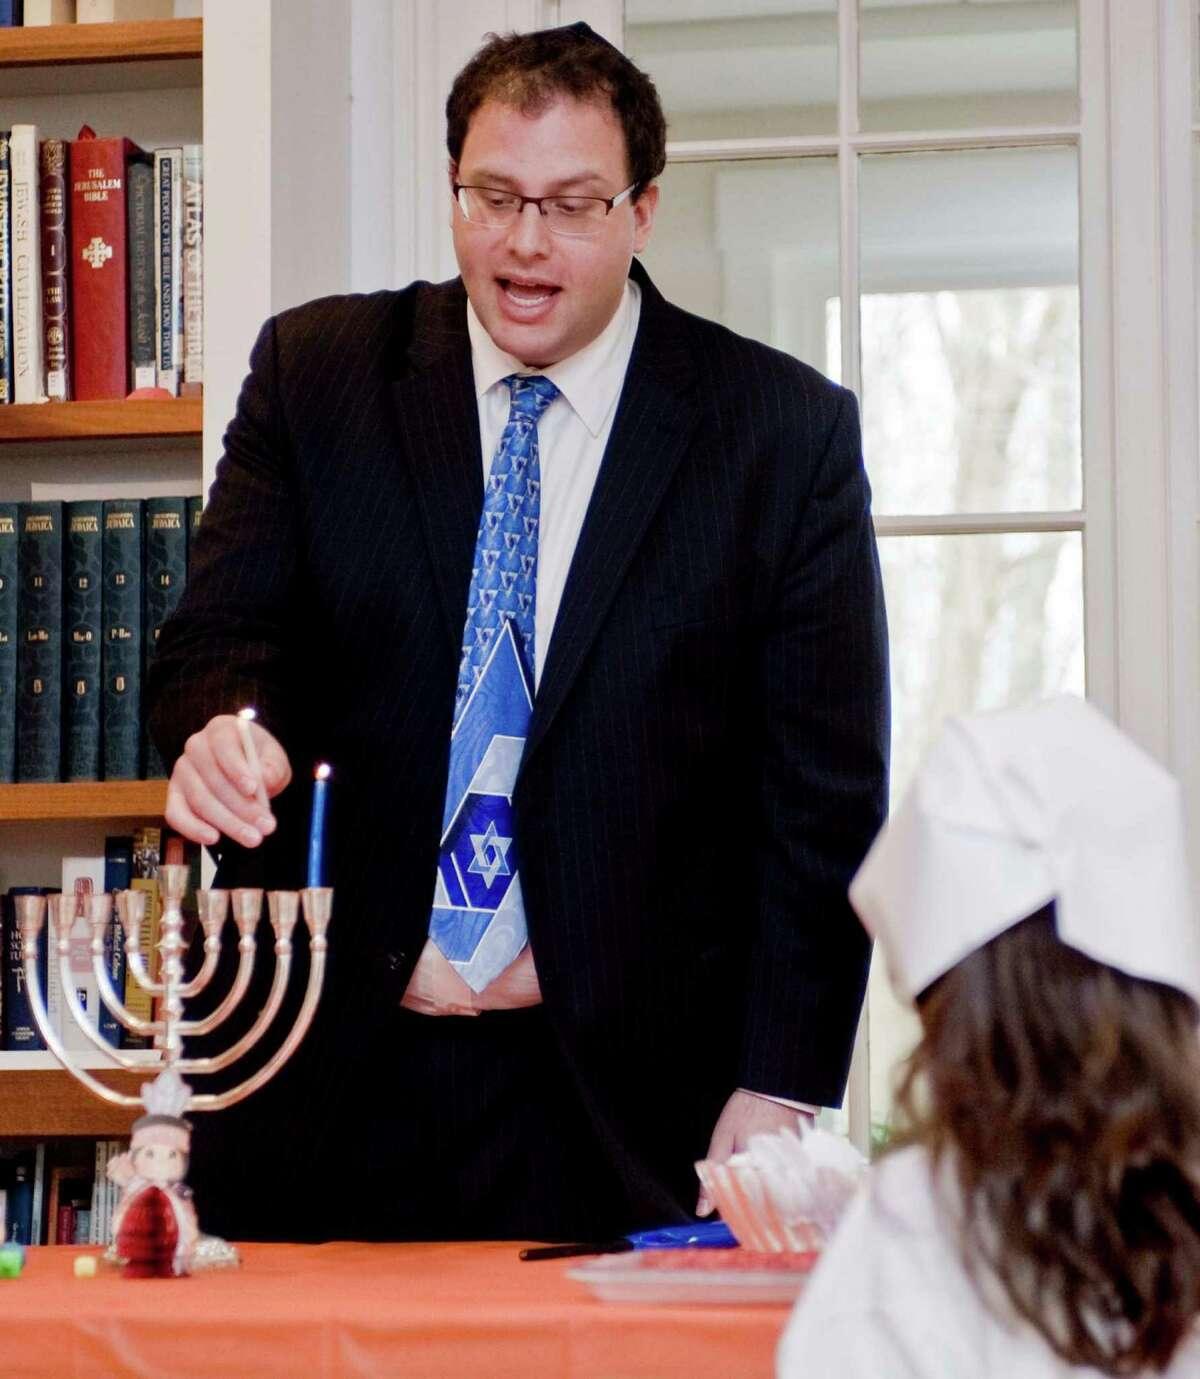 Rabbi David Reiner of Temple Shearith Israel in Ridgefield